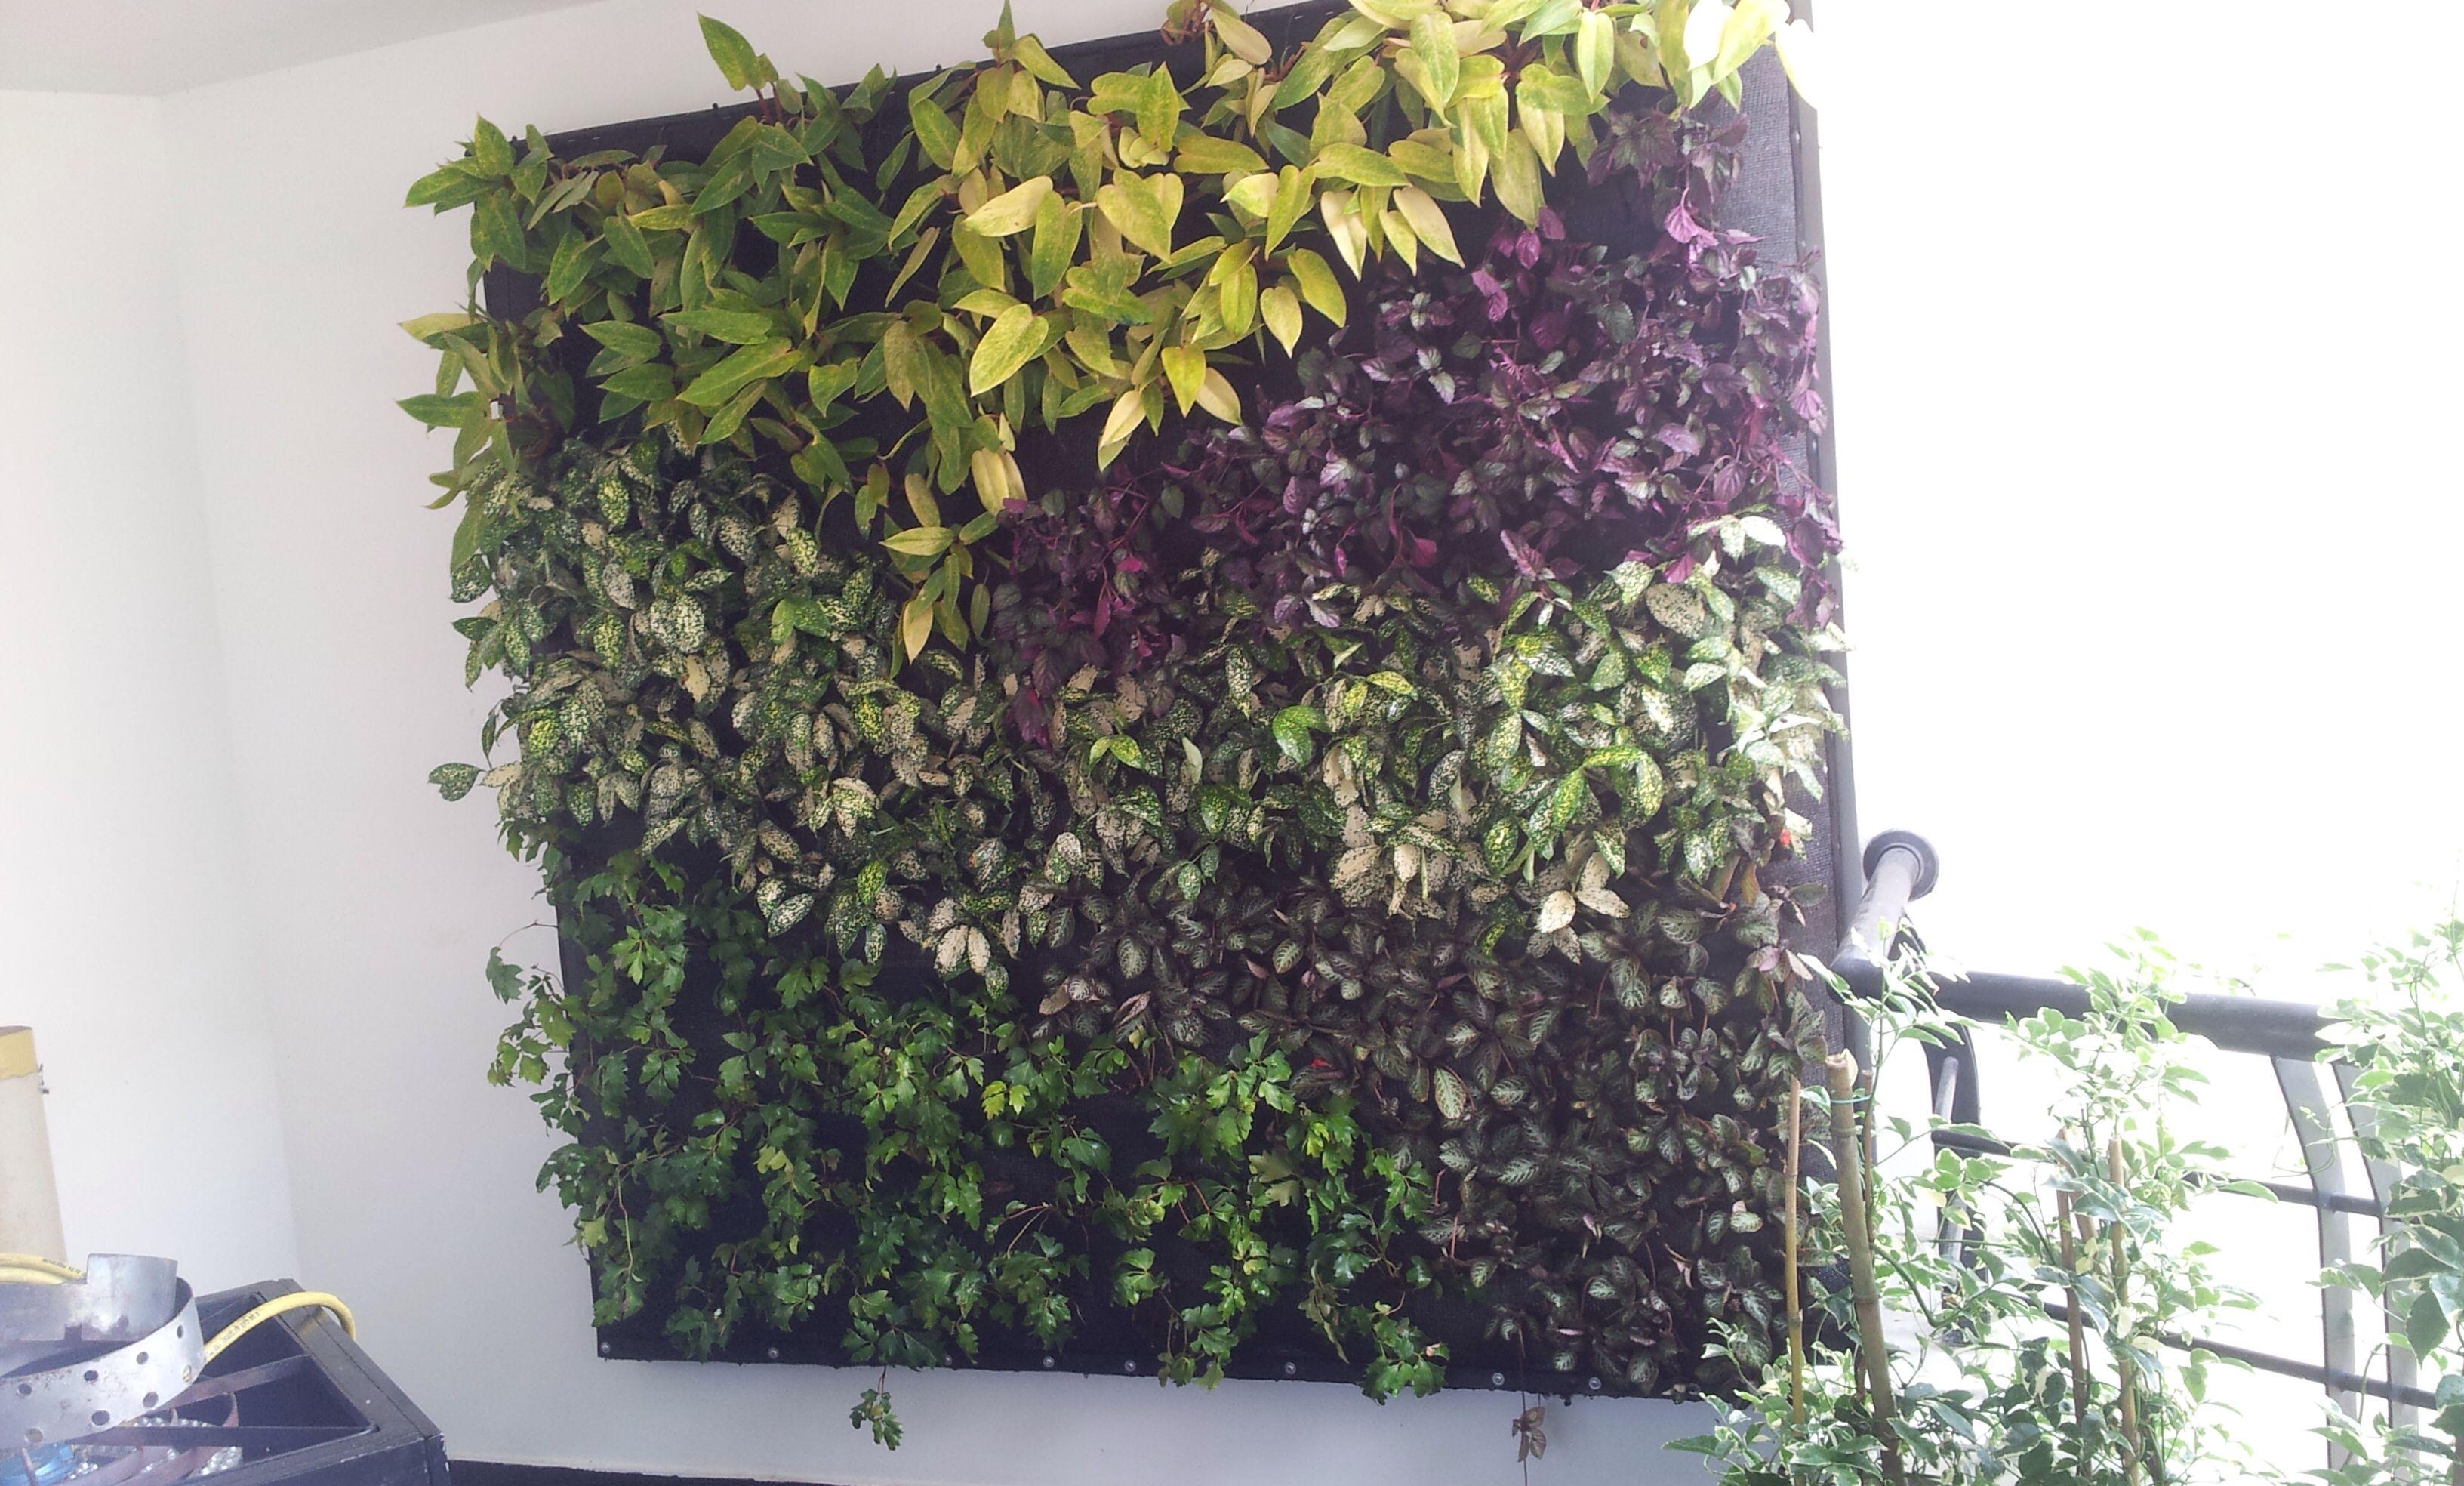 Balc n con jard n vertical precioso jardines for Balcon jardin vertical